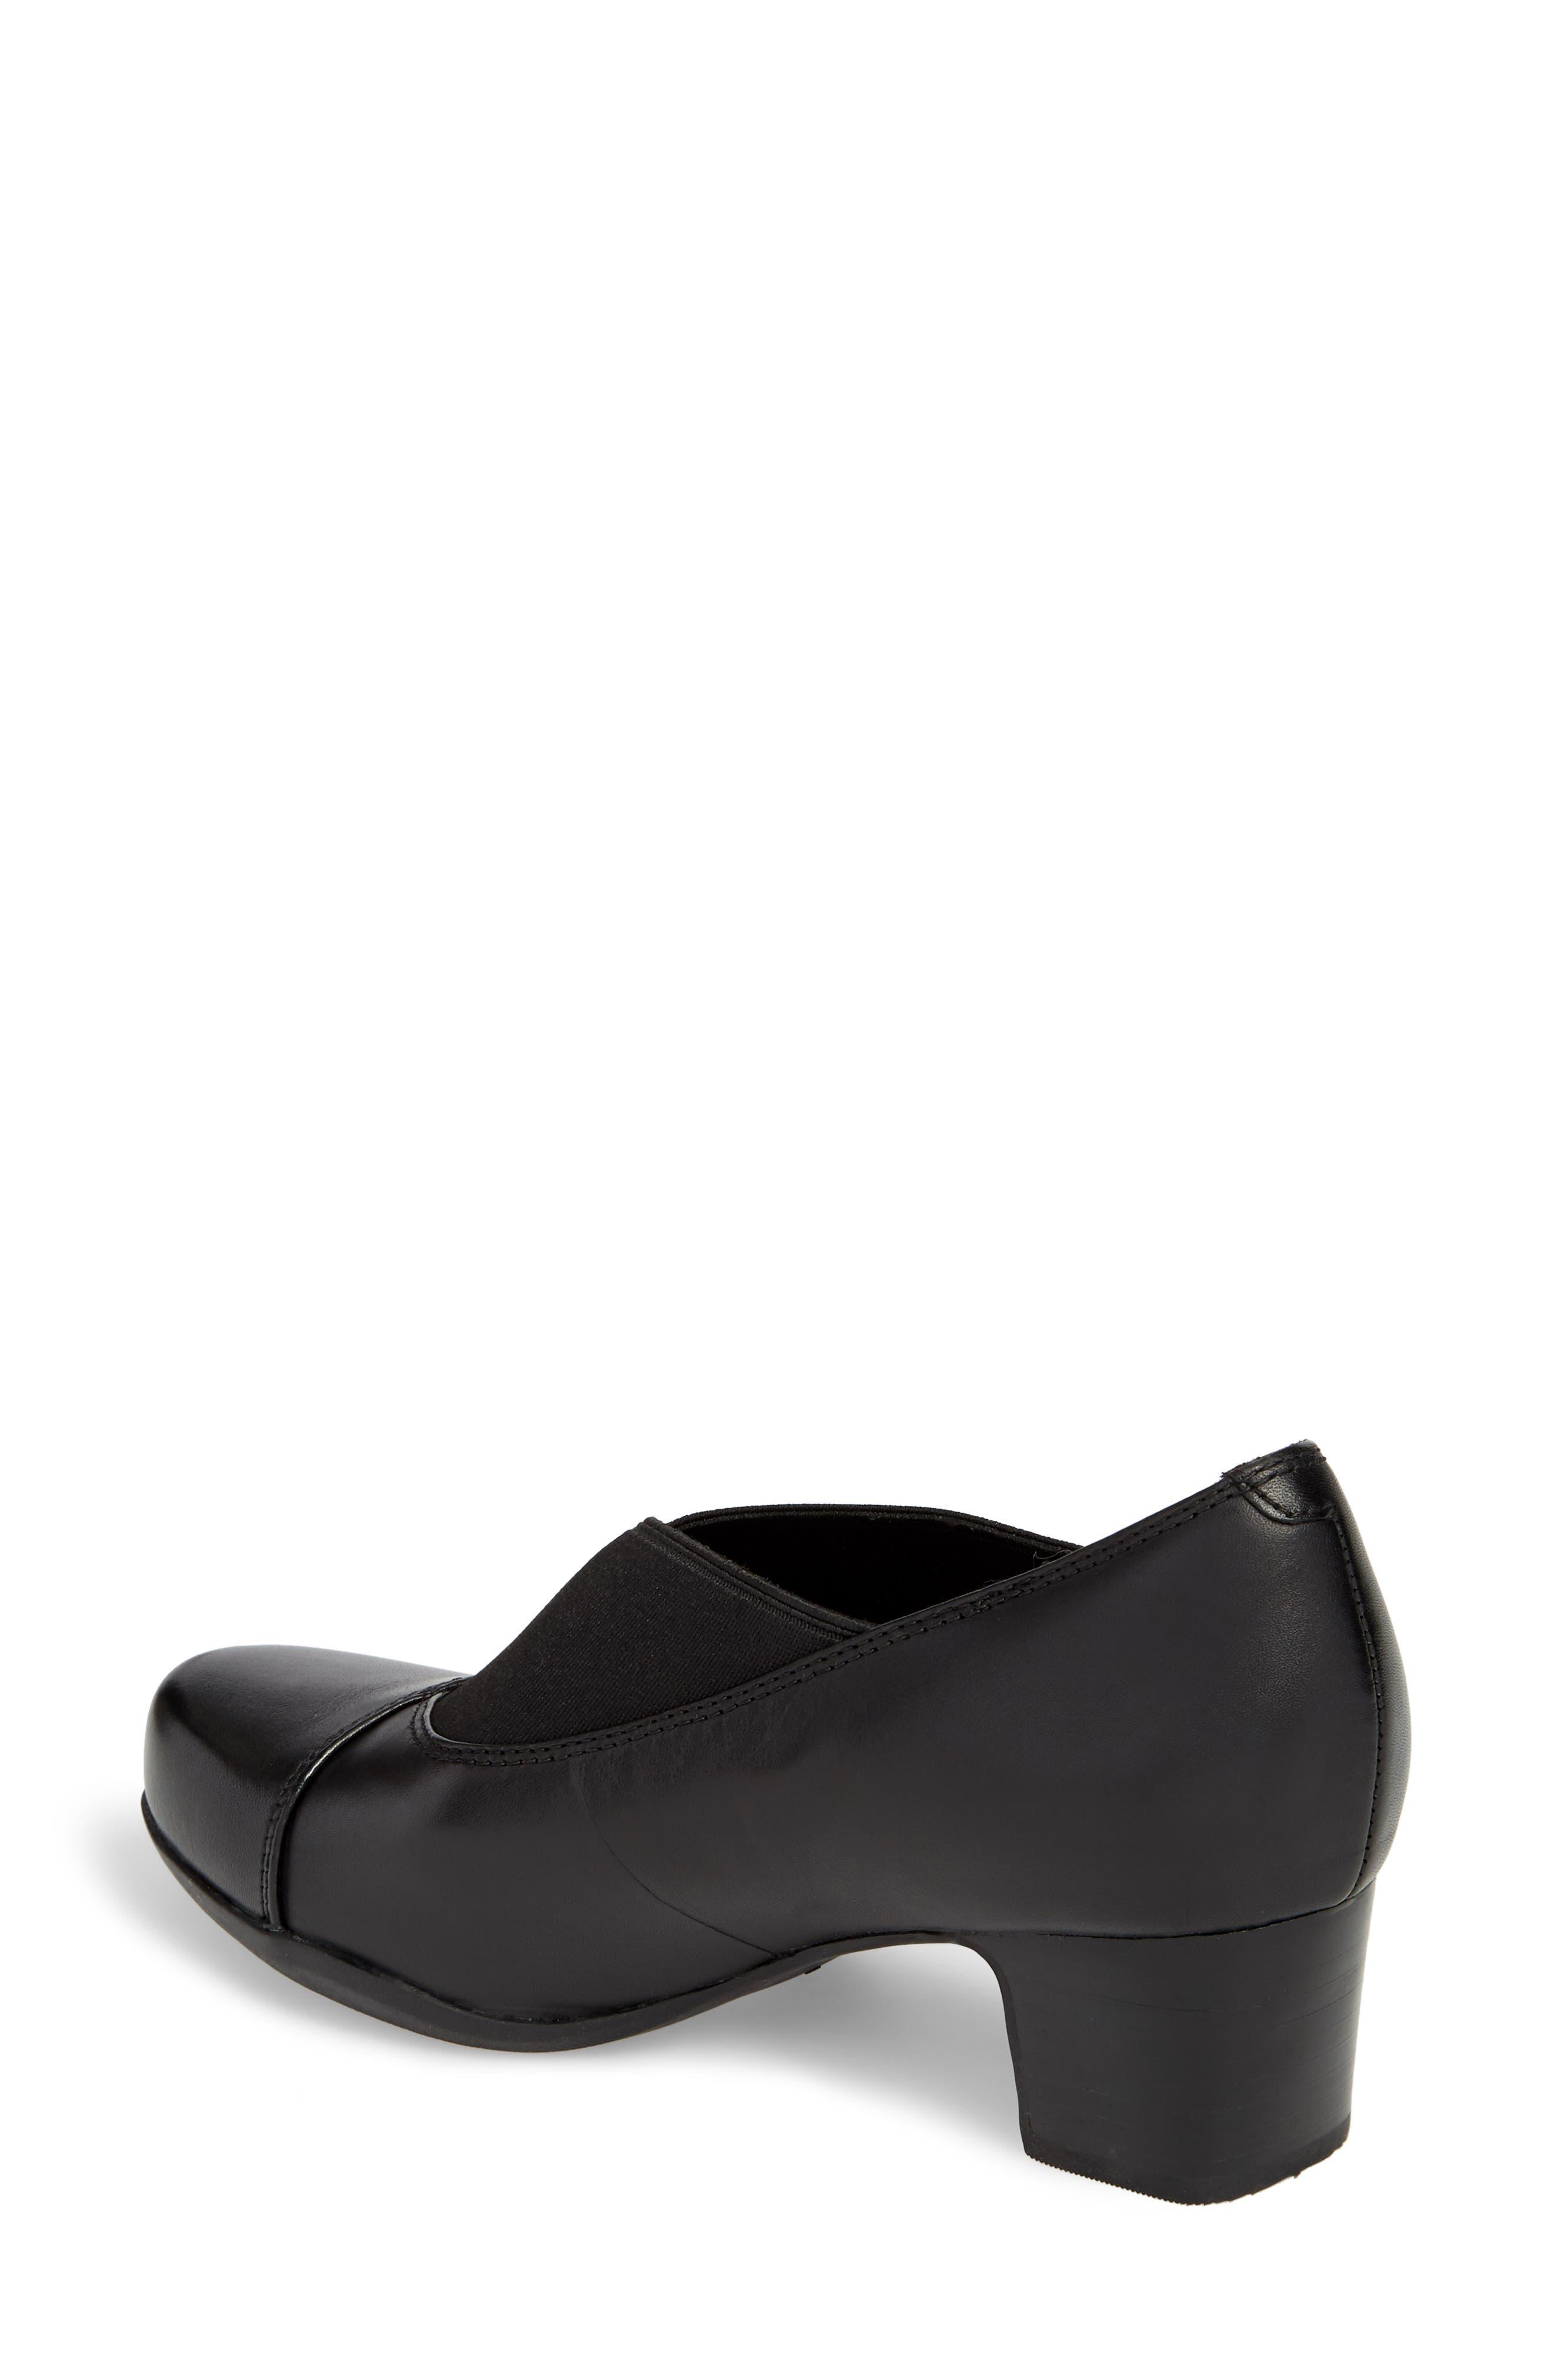 Rosalyn Olivia Pump,                             Alternate thumbnail 2, color,                             Black Leather